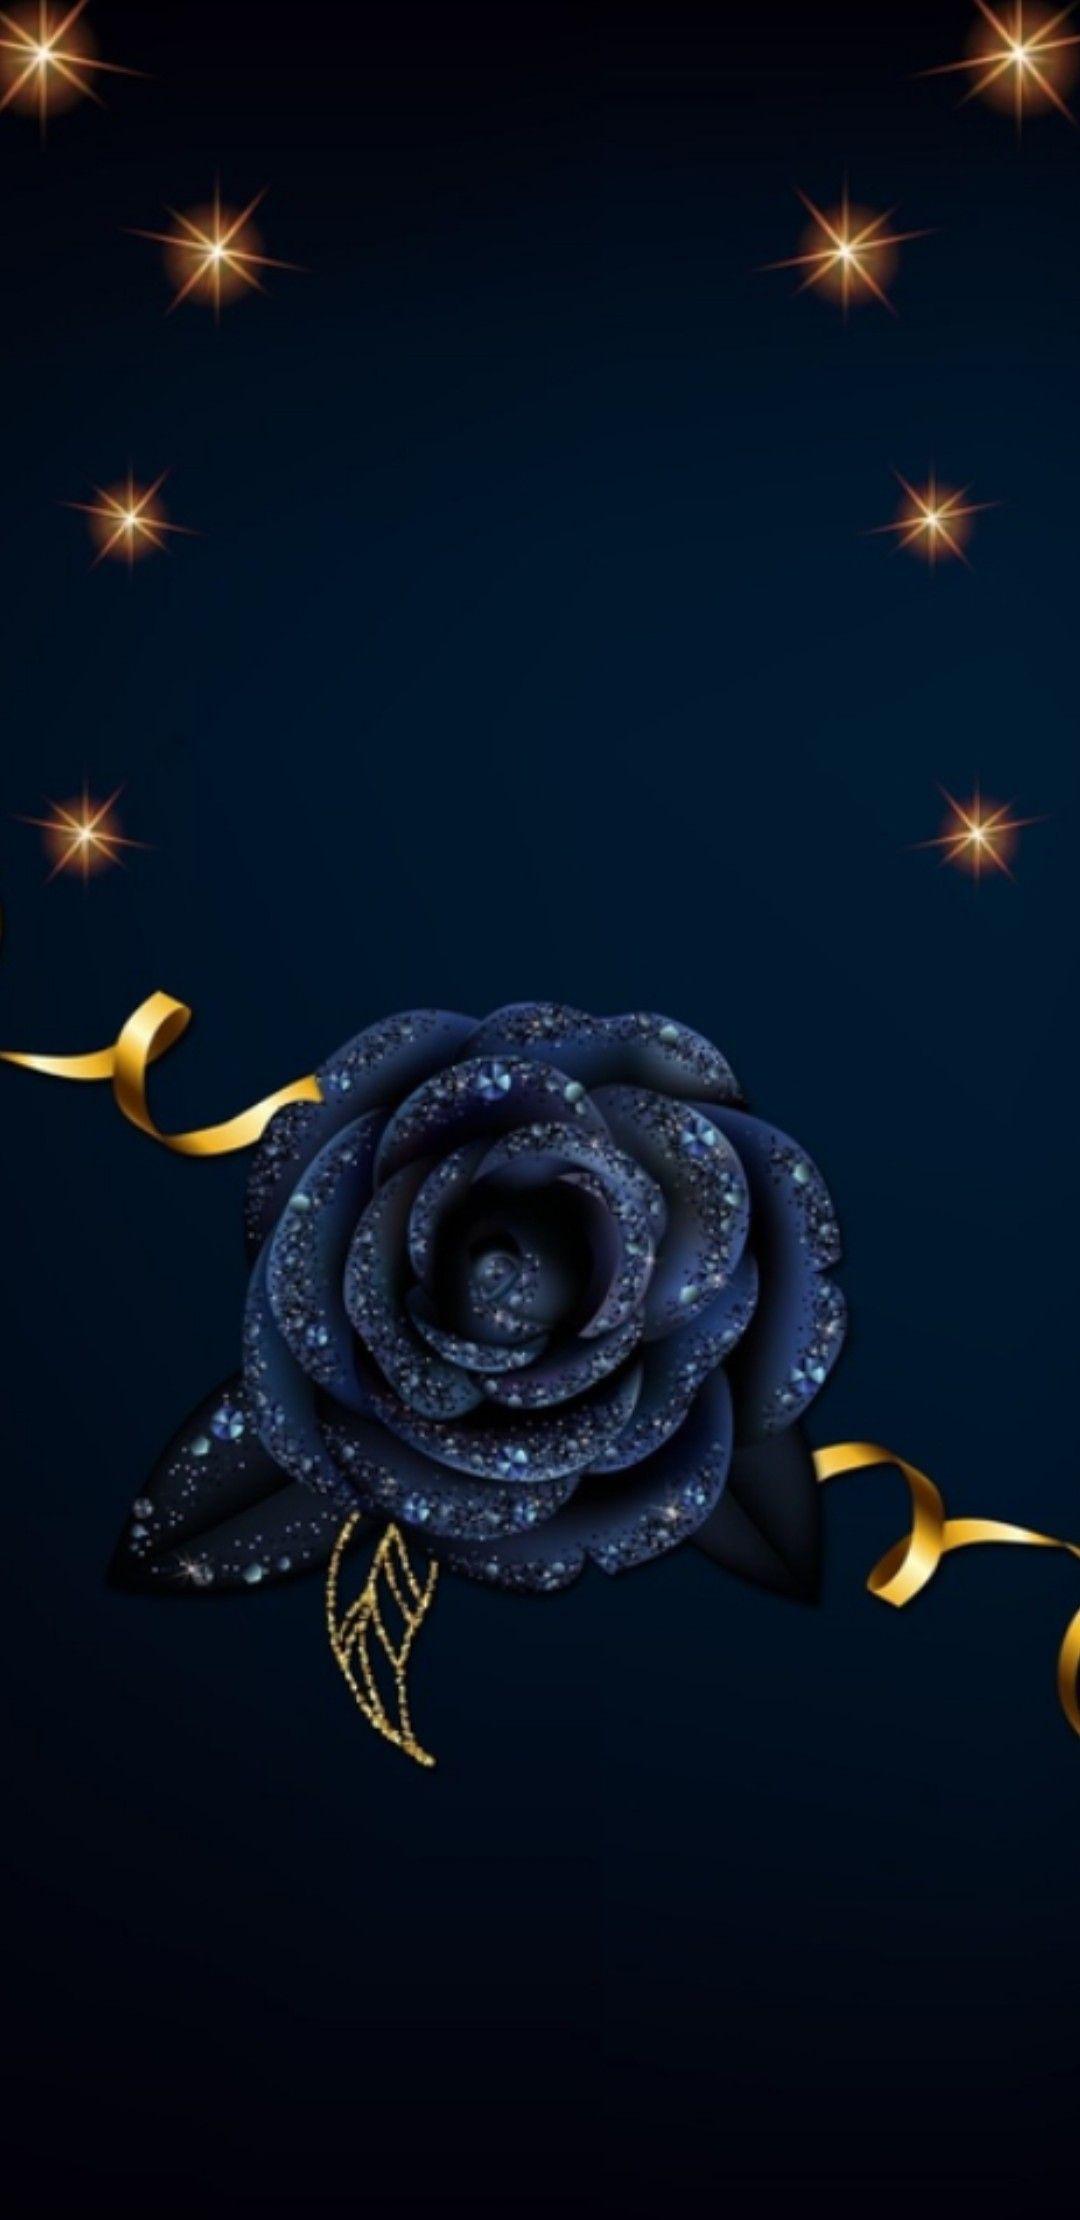 Rosa Blu Notte Phone Backgrounds Wallpaper Backgrounds Lock